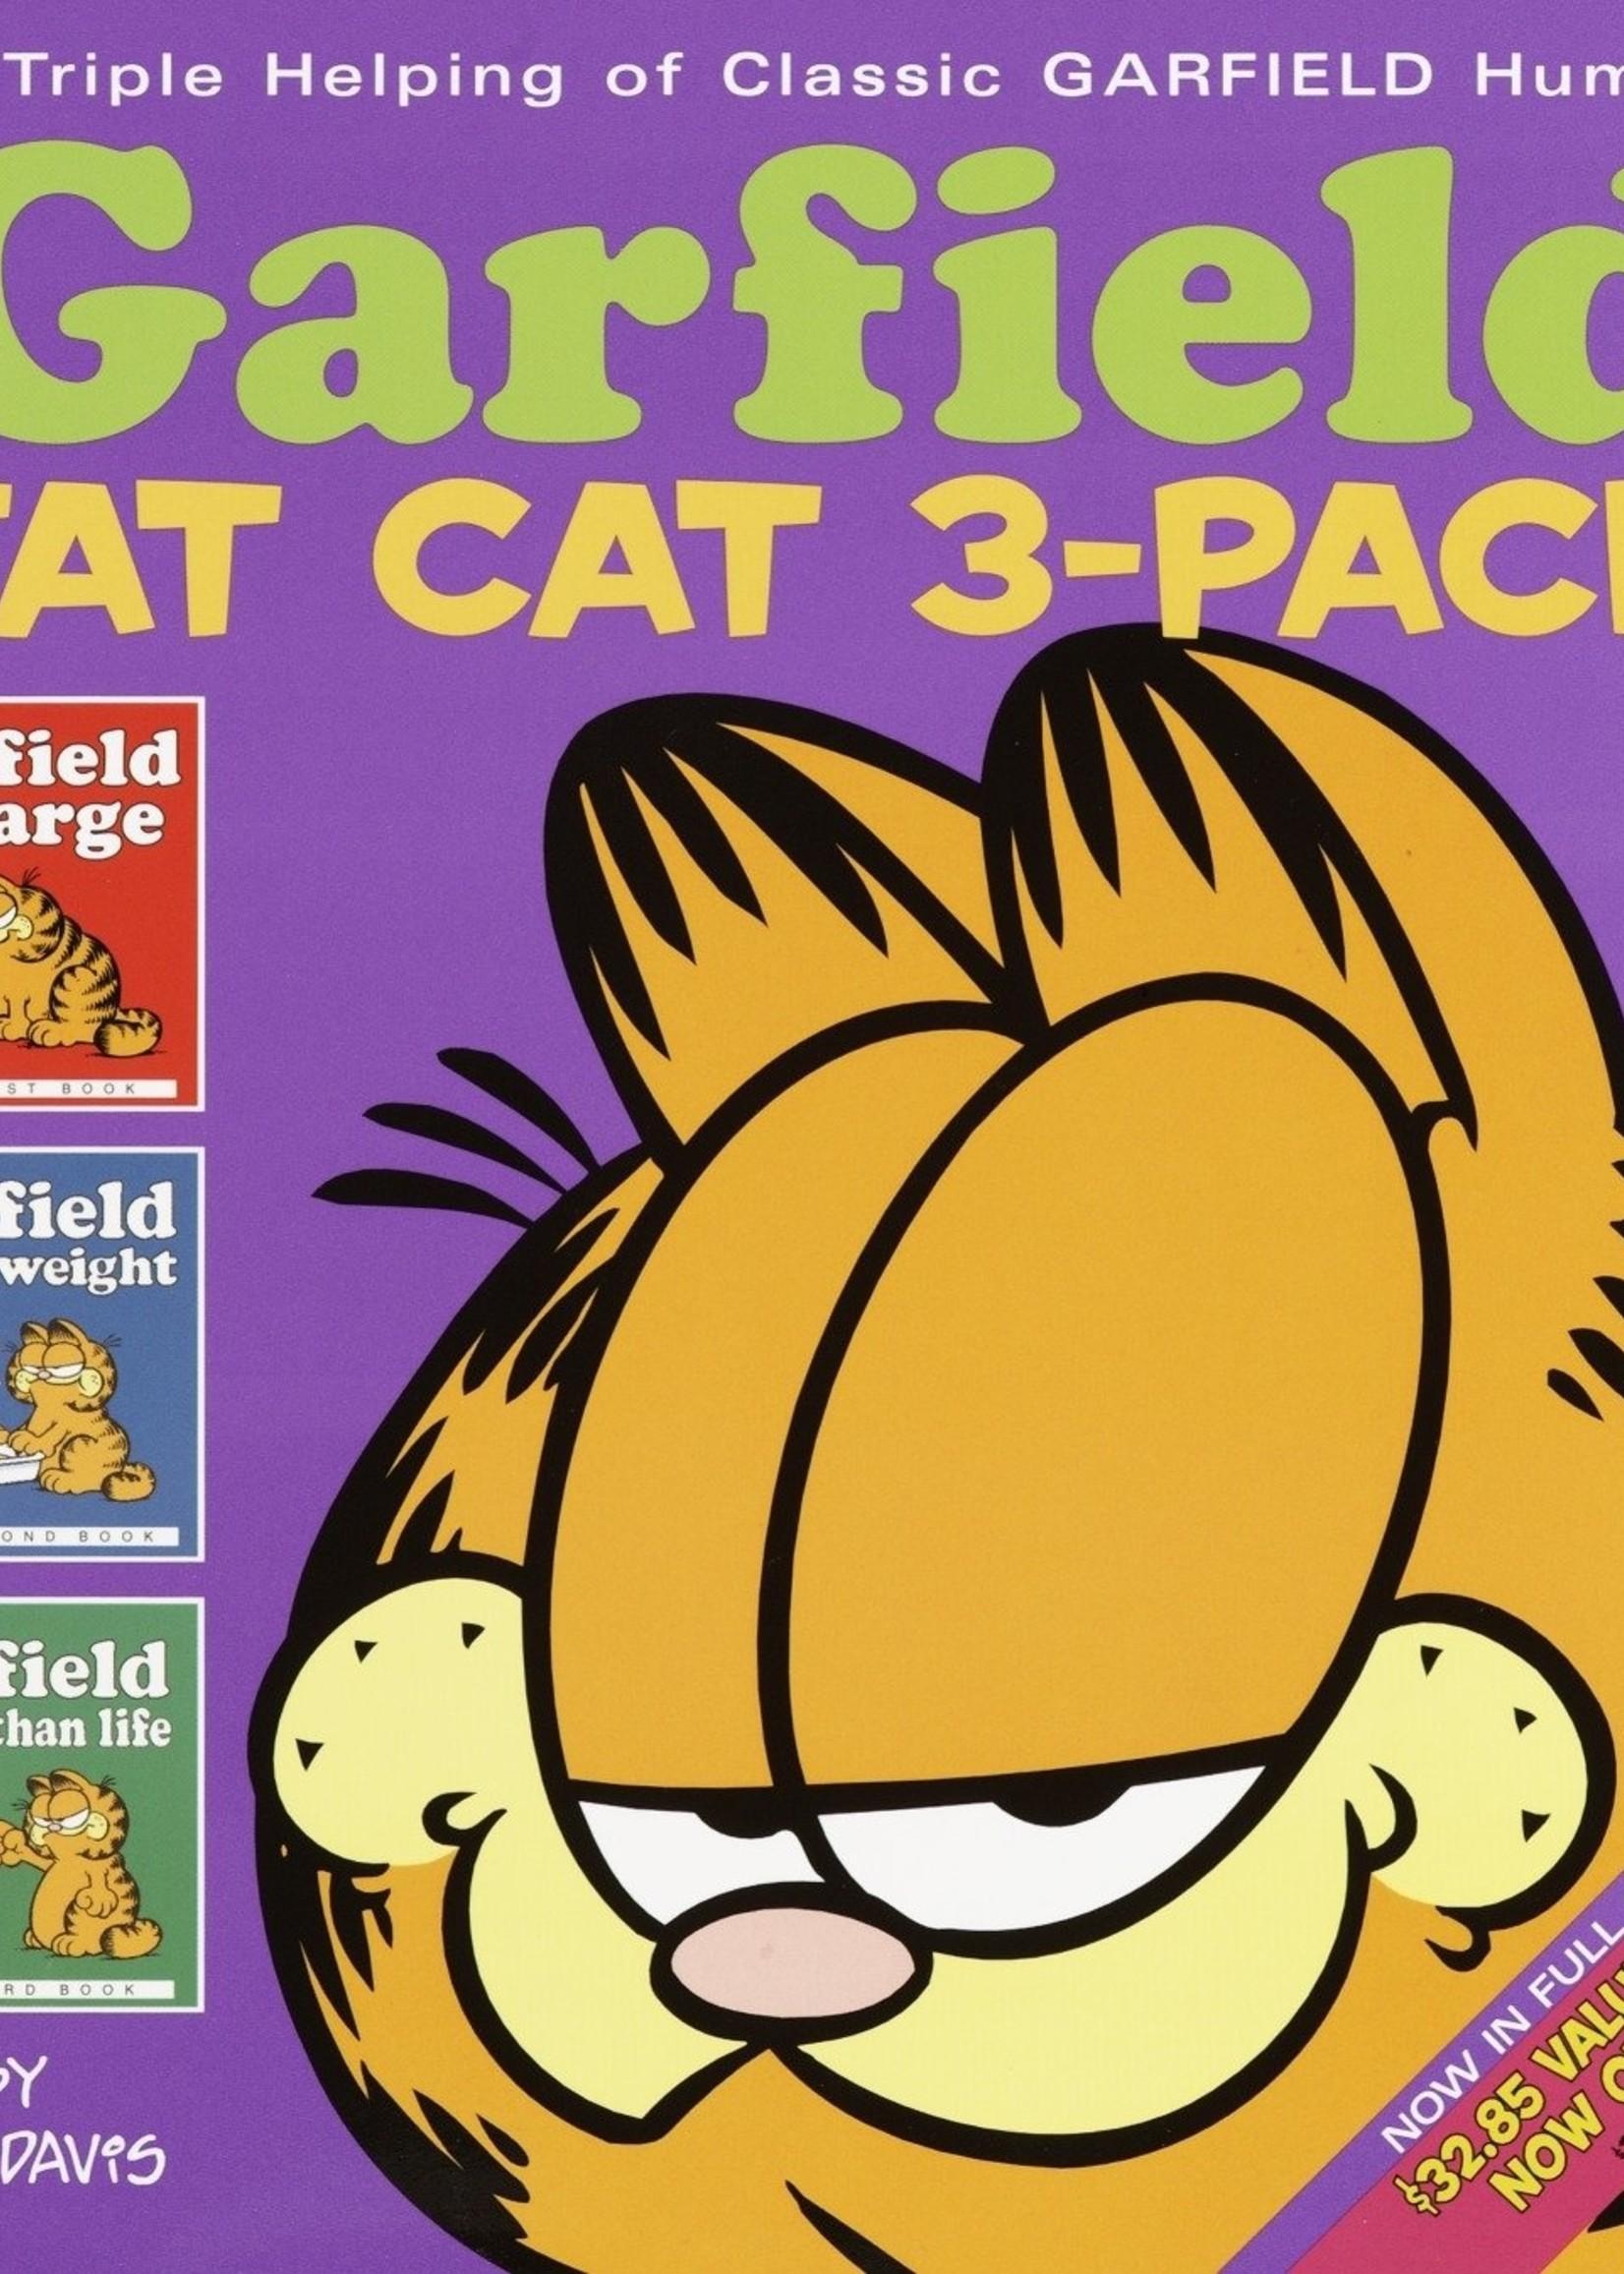 Garfield Fat Cat 3-Pack #01 - Paperback